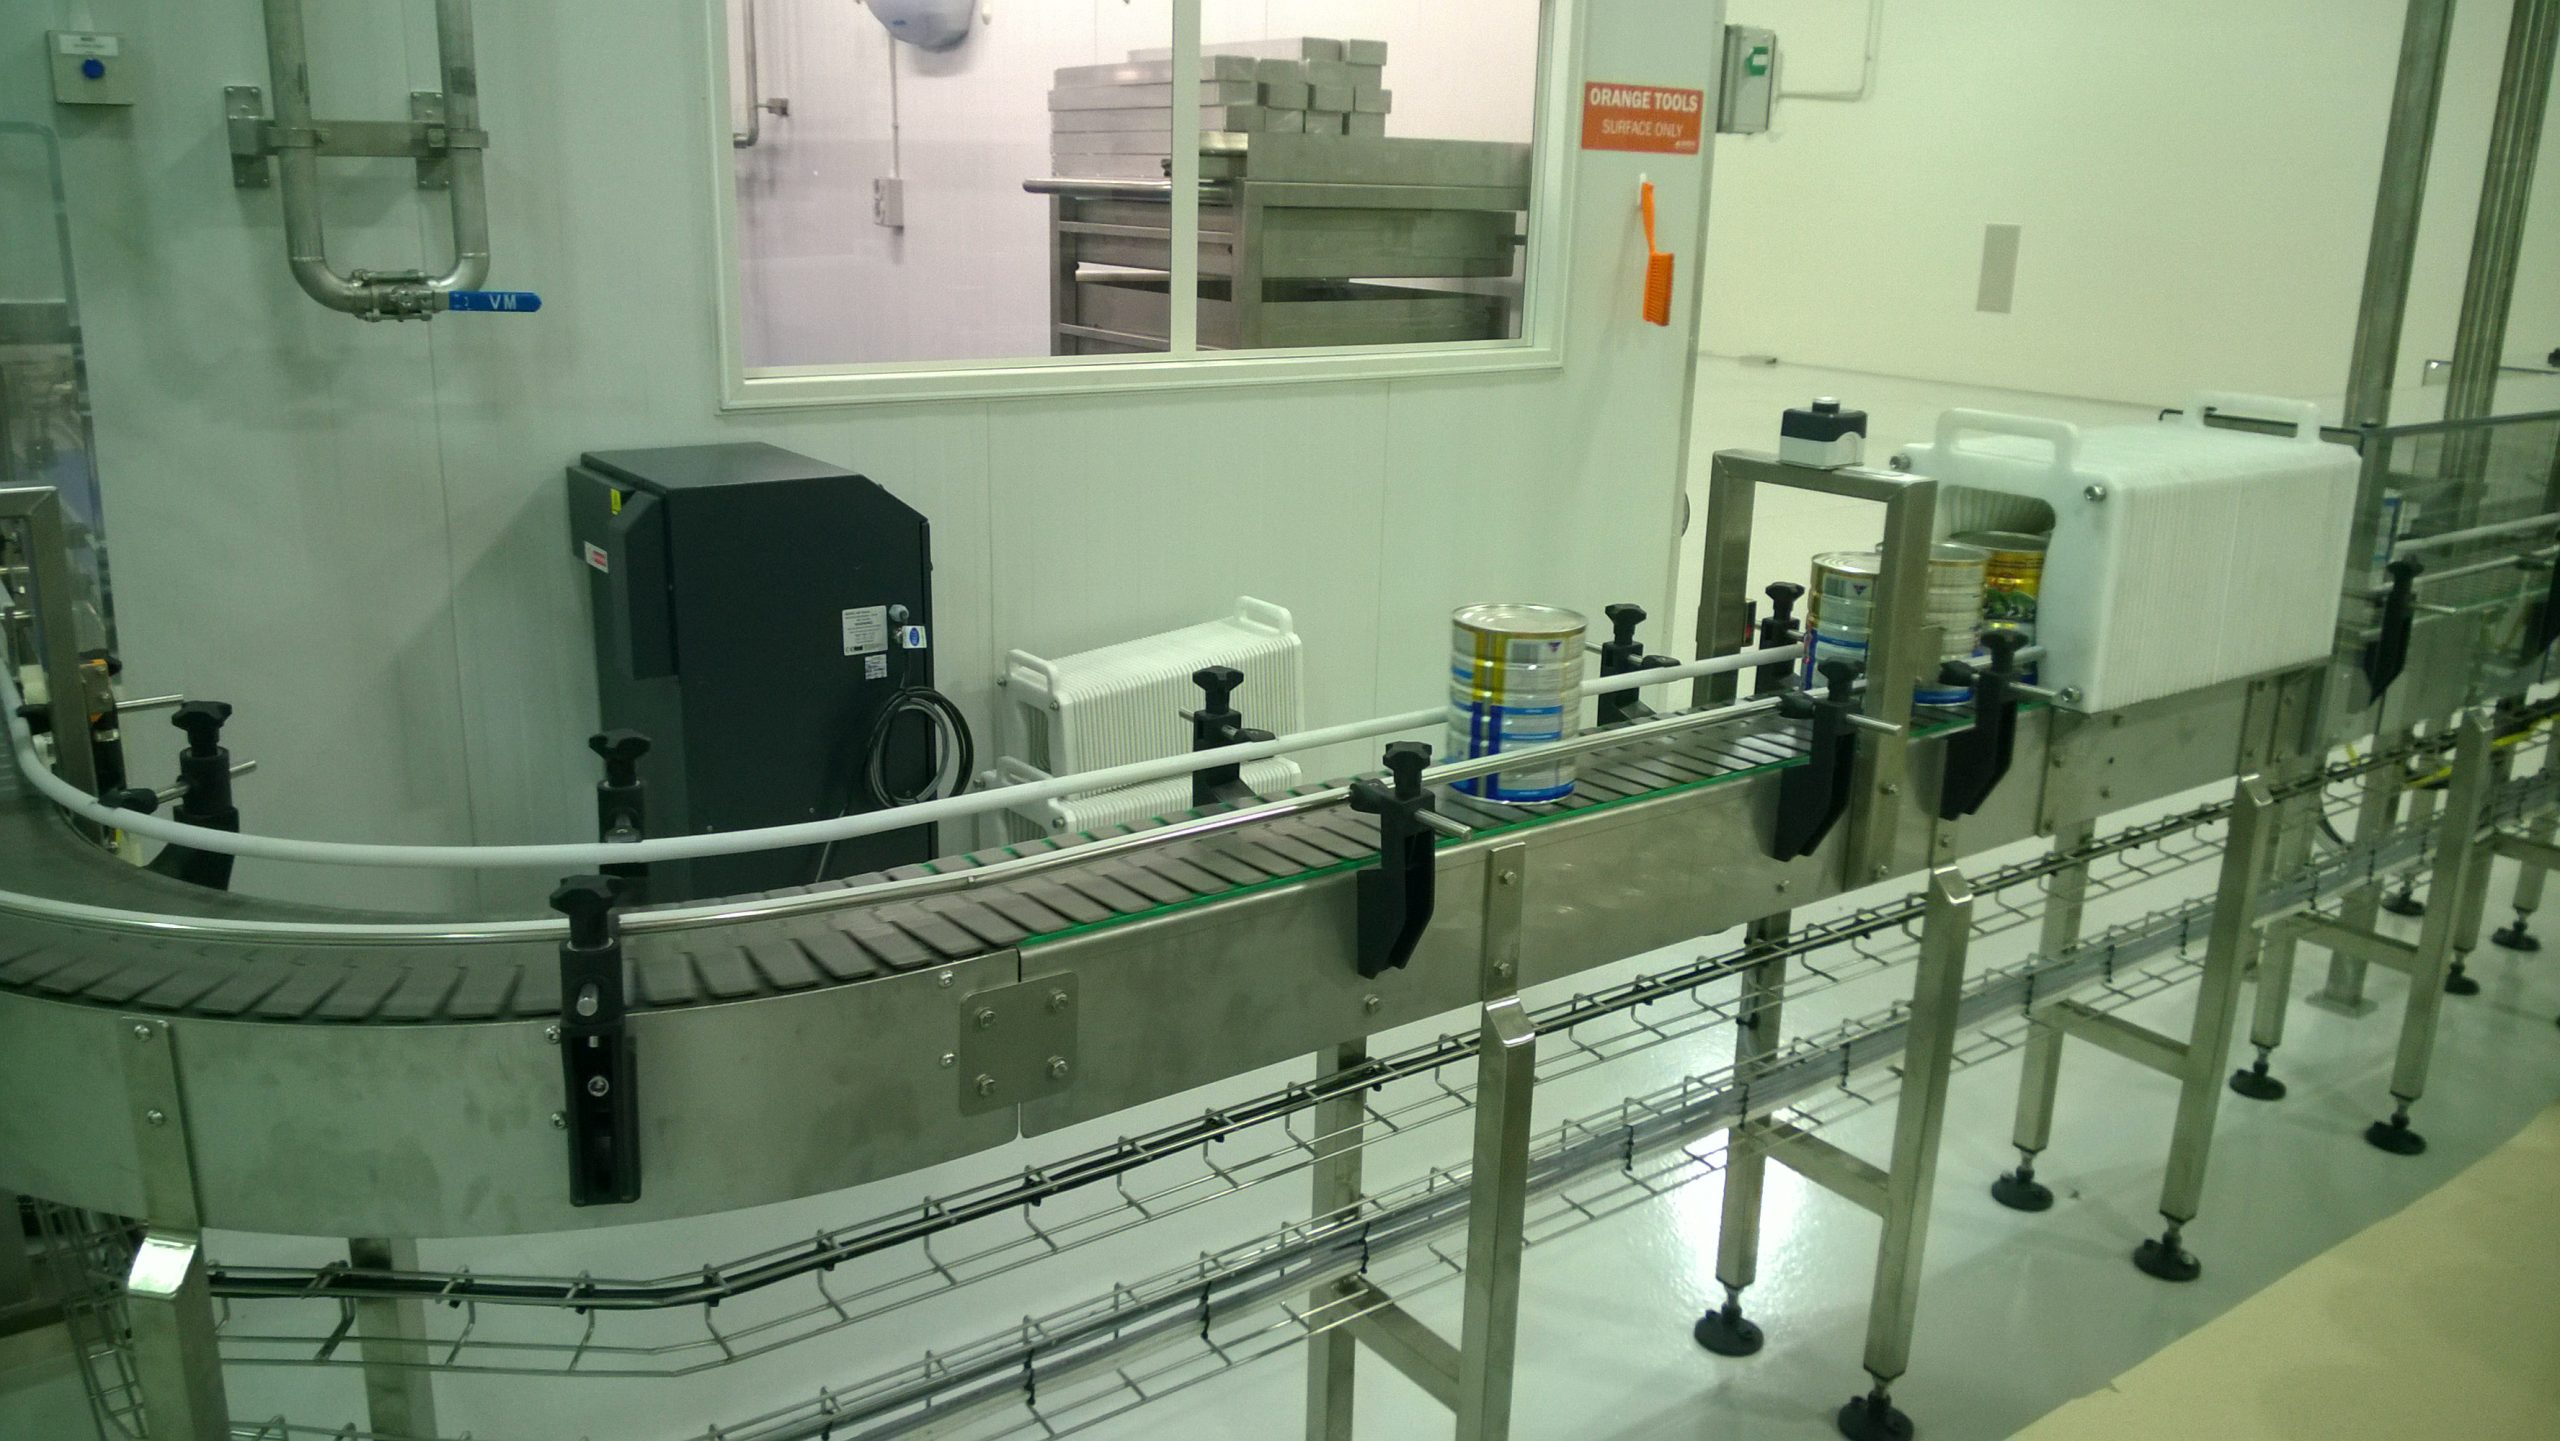 Production line image